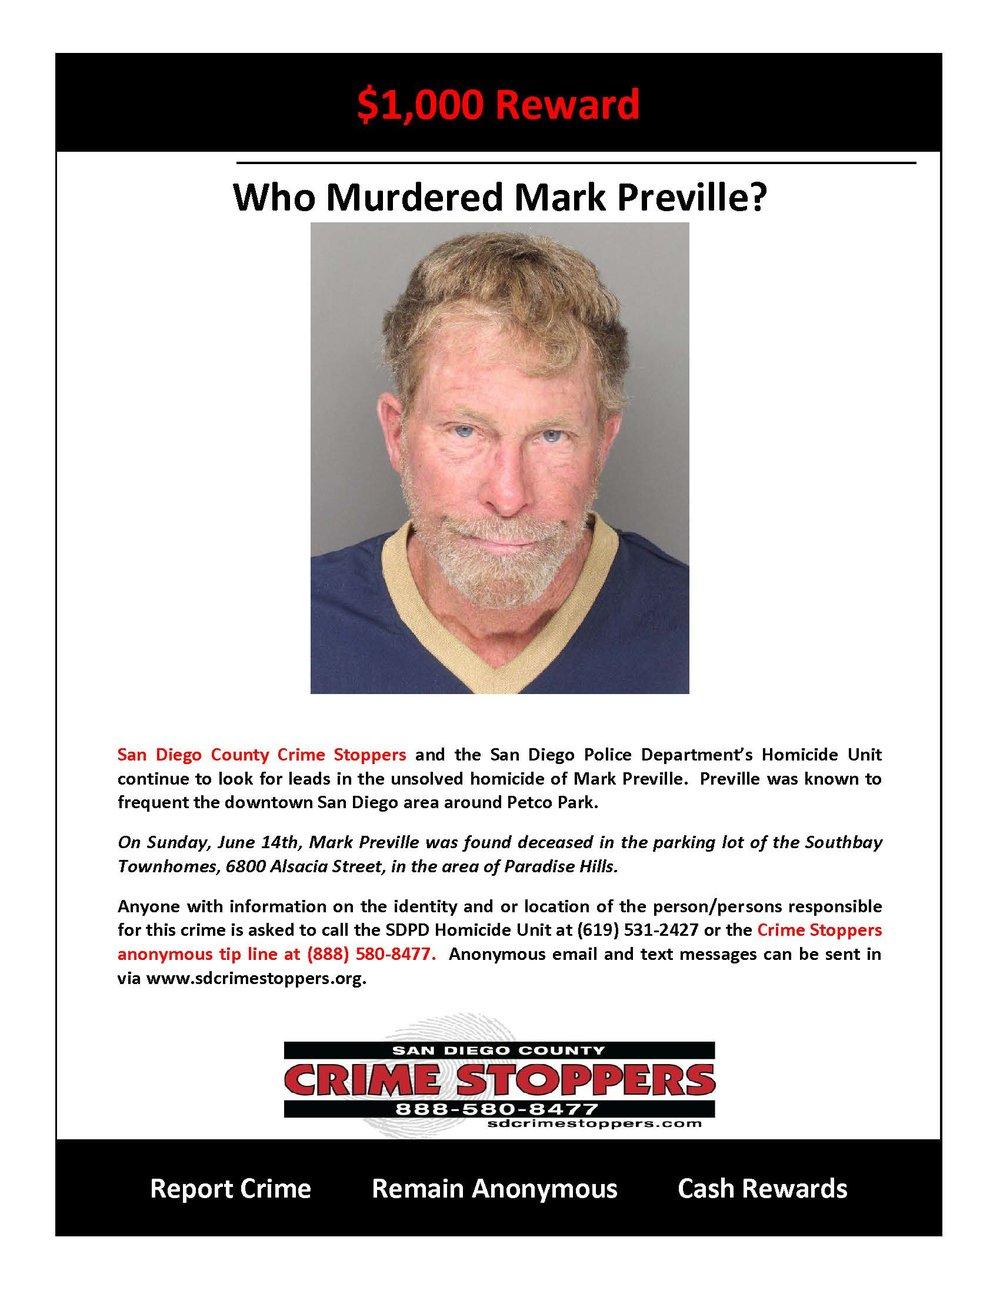 070215 Who Murdered Mark Preville